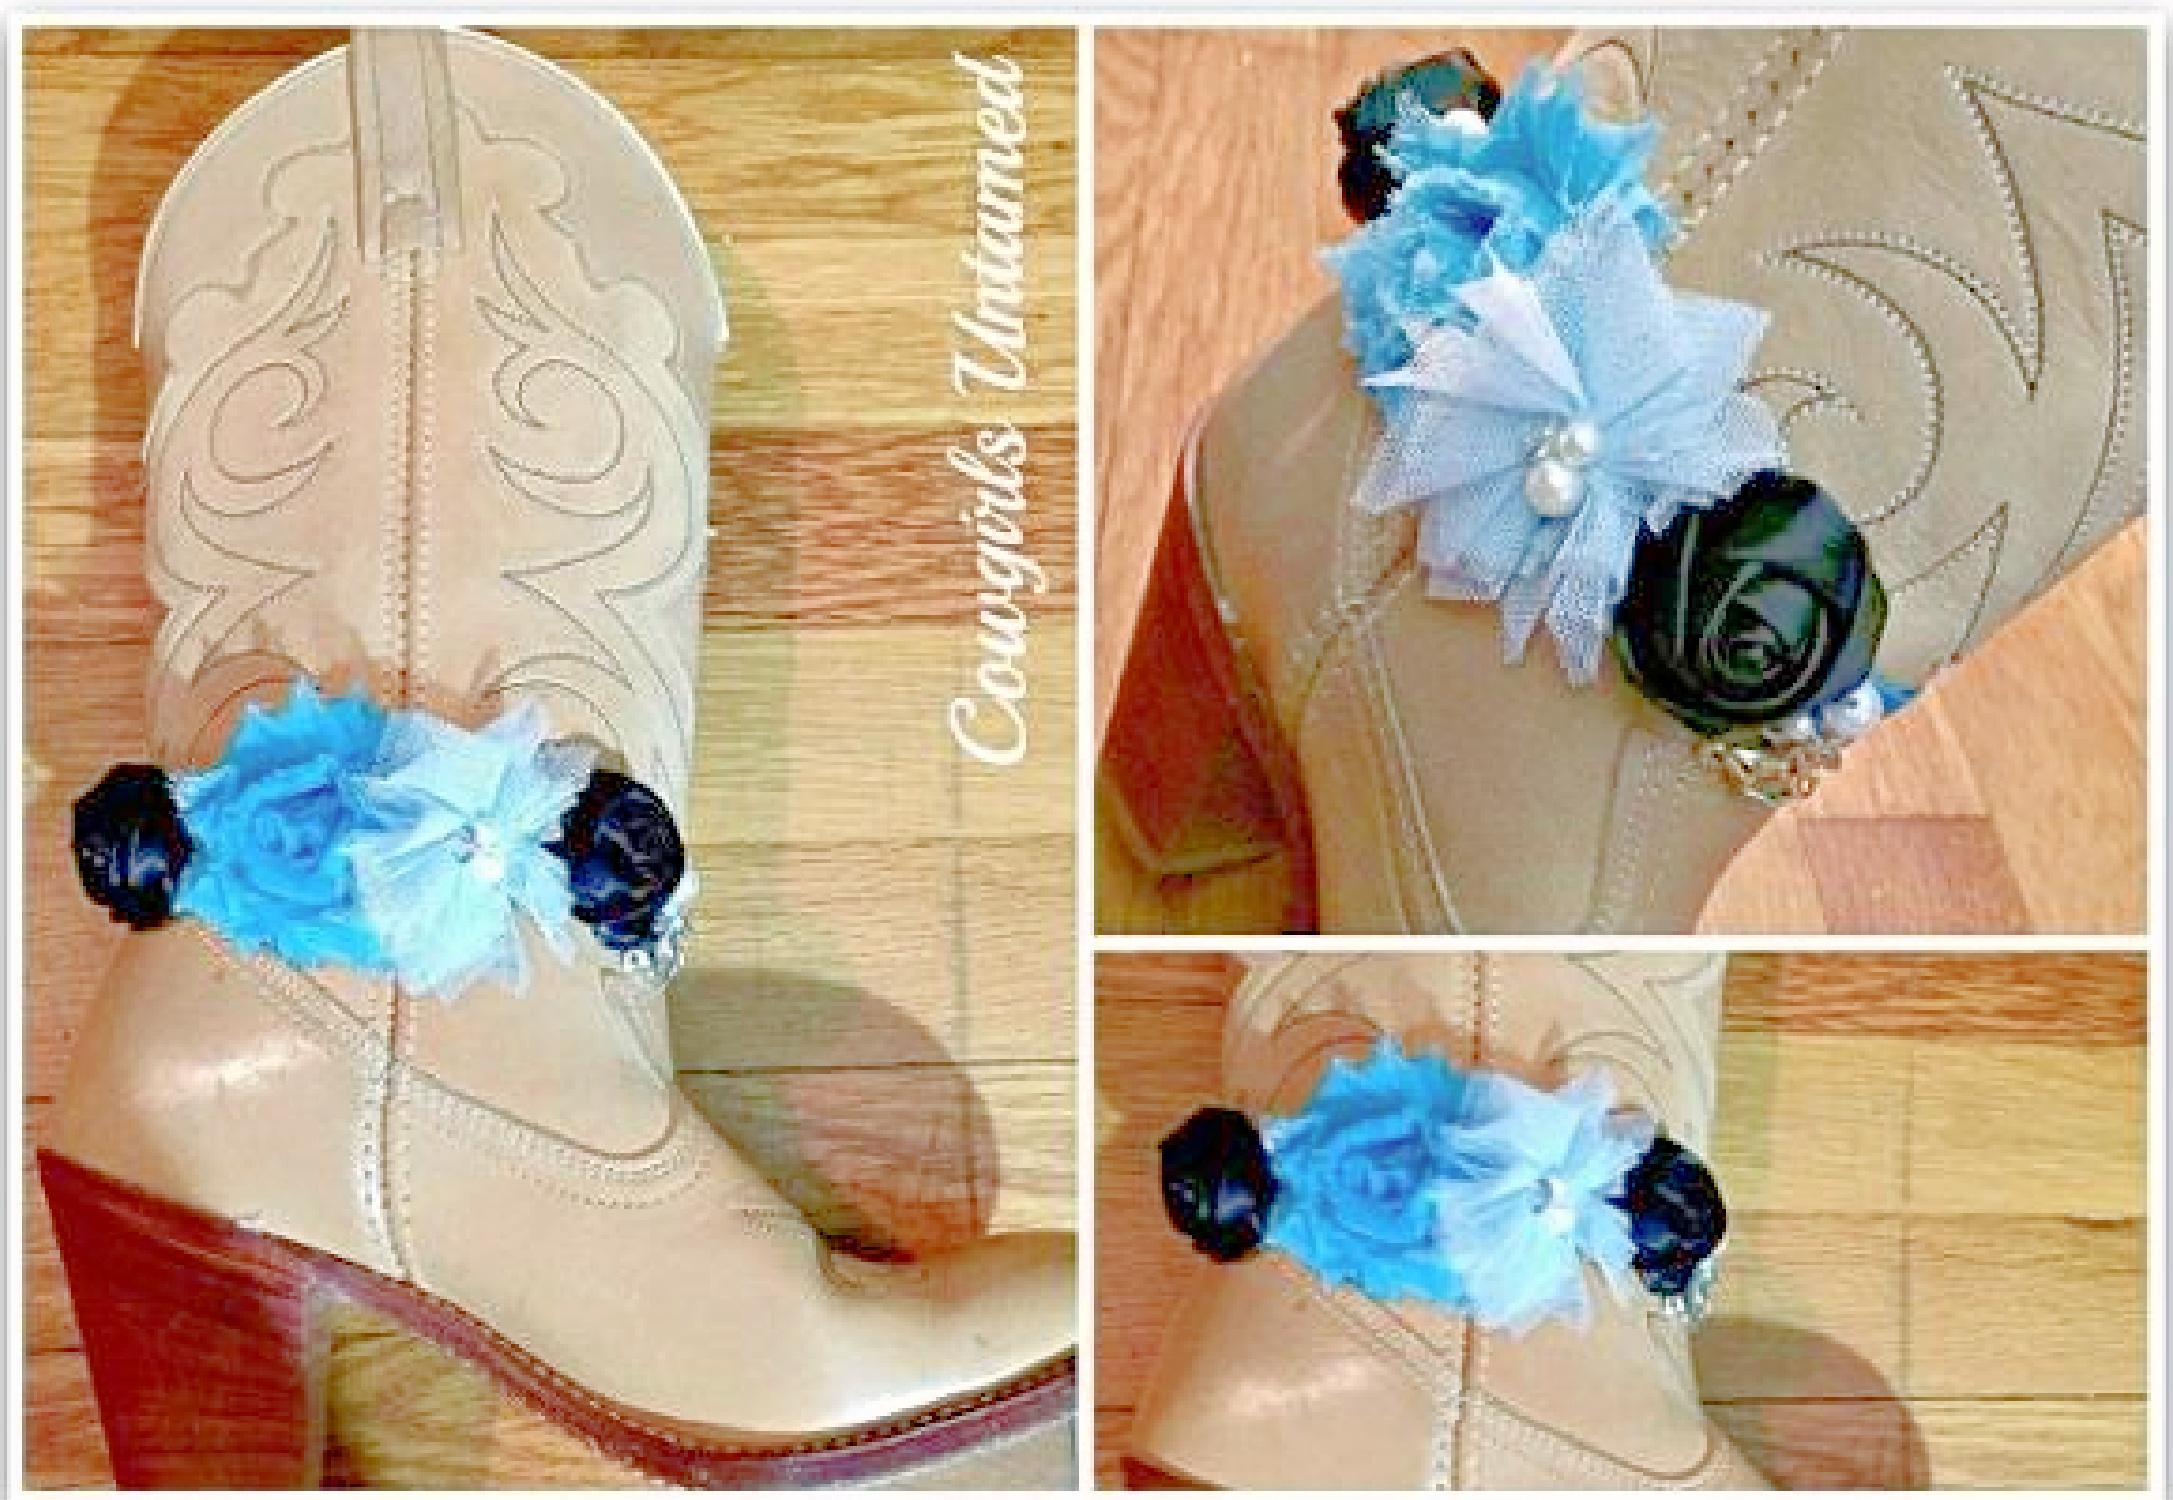 WILDFLOWER BOOT GARTER  Blue Turquoise and Black Silk Flowers Pearls Rhinestones Horse Charm Boot Cuff